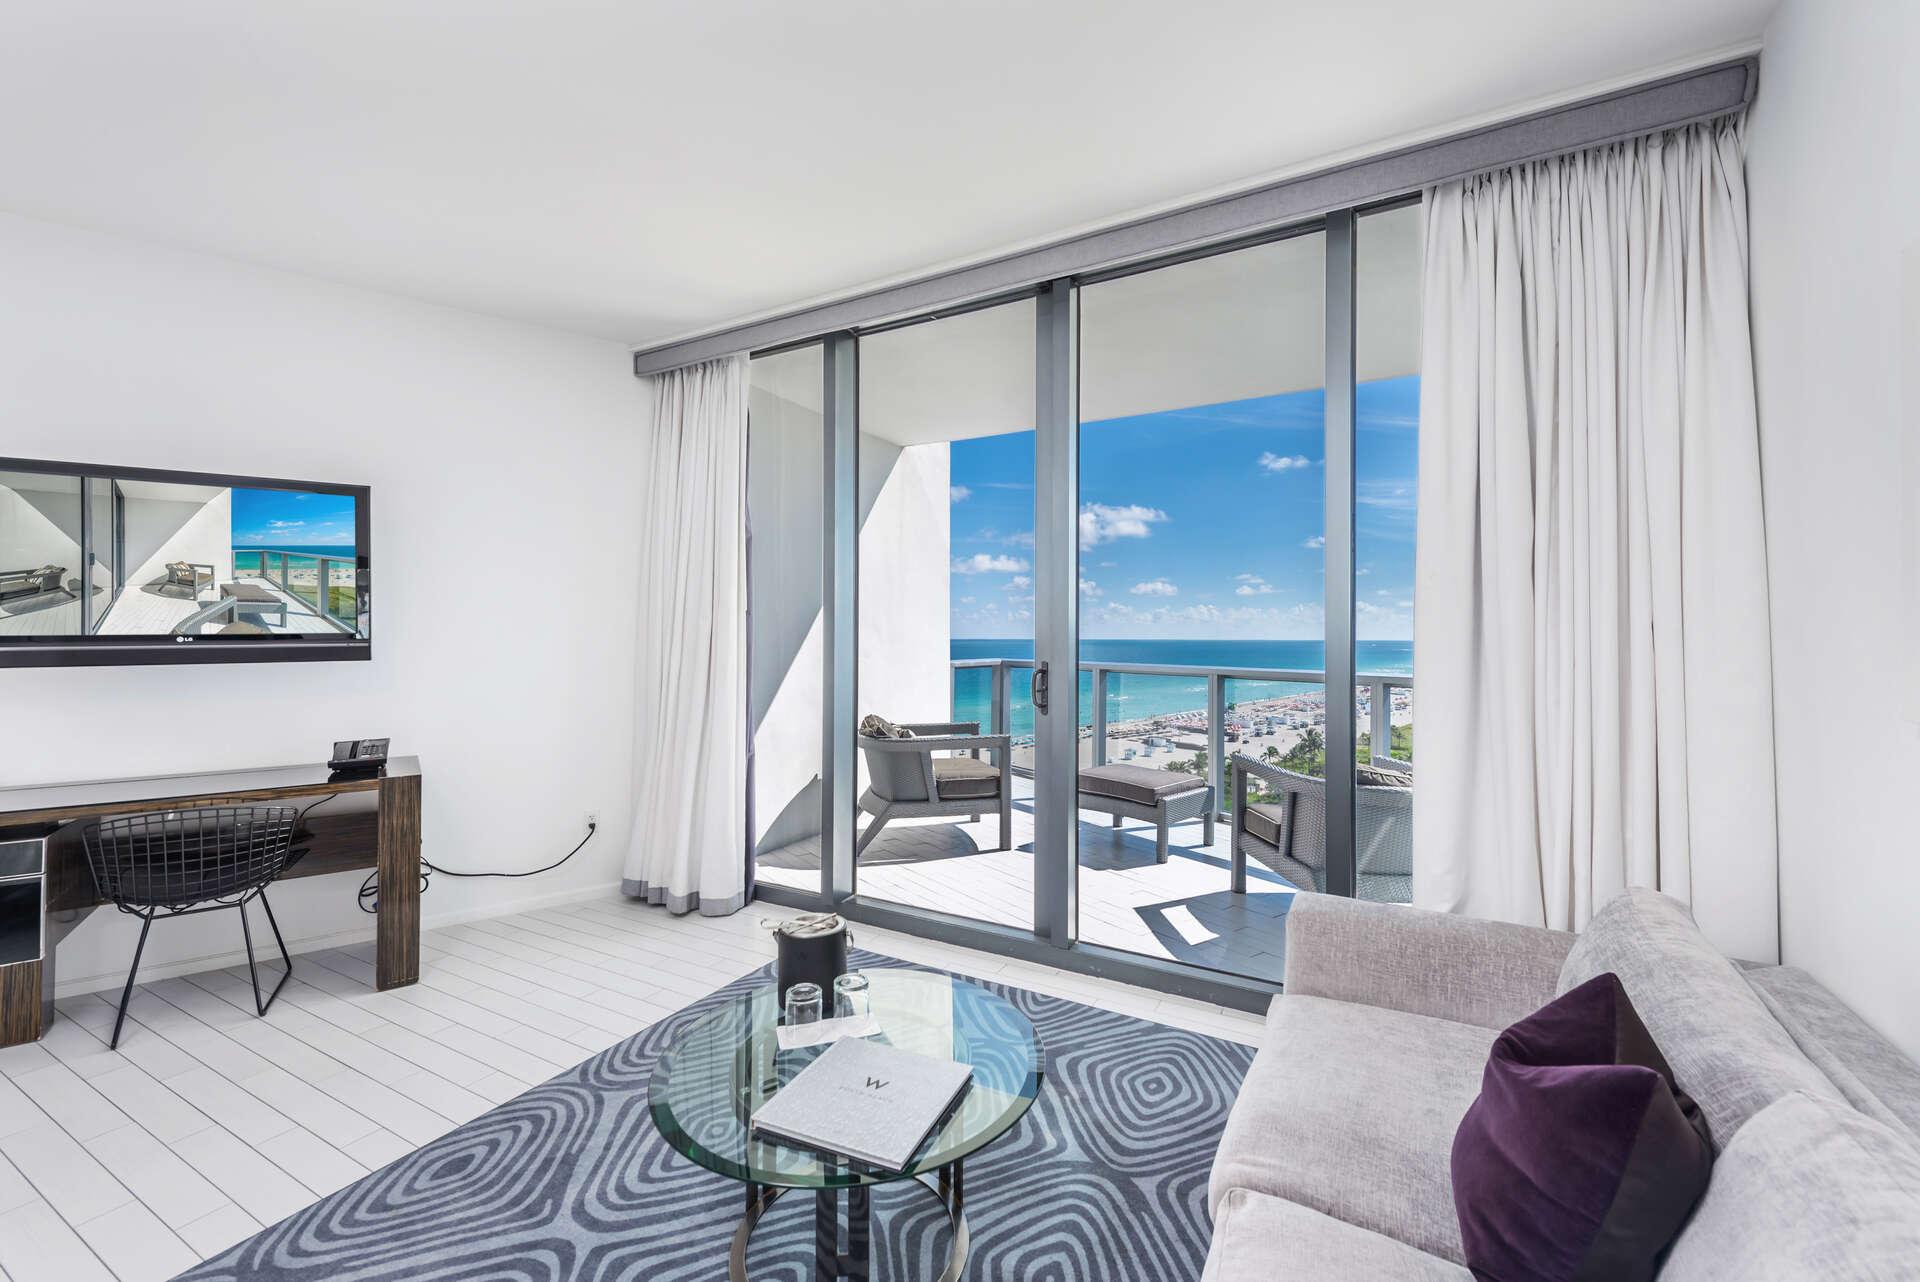 Luxury vacation rentals usa - Florida - Miami beach - W hotel south beach - #1226 | Studio Suite - Image 1/12